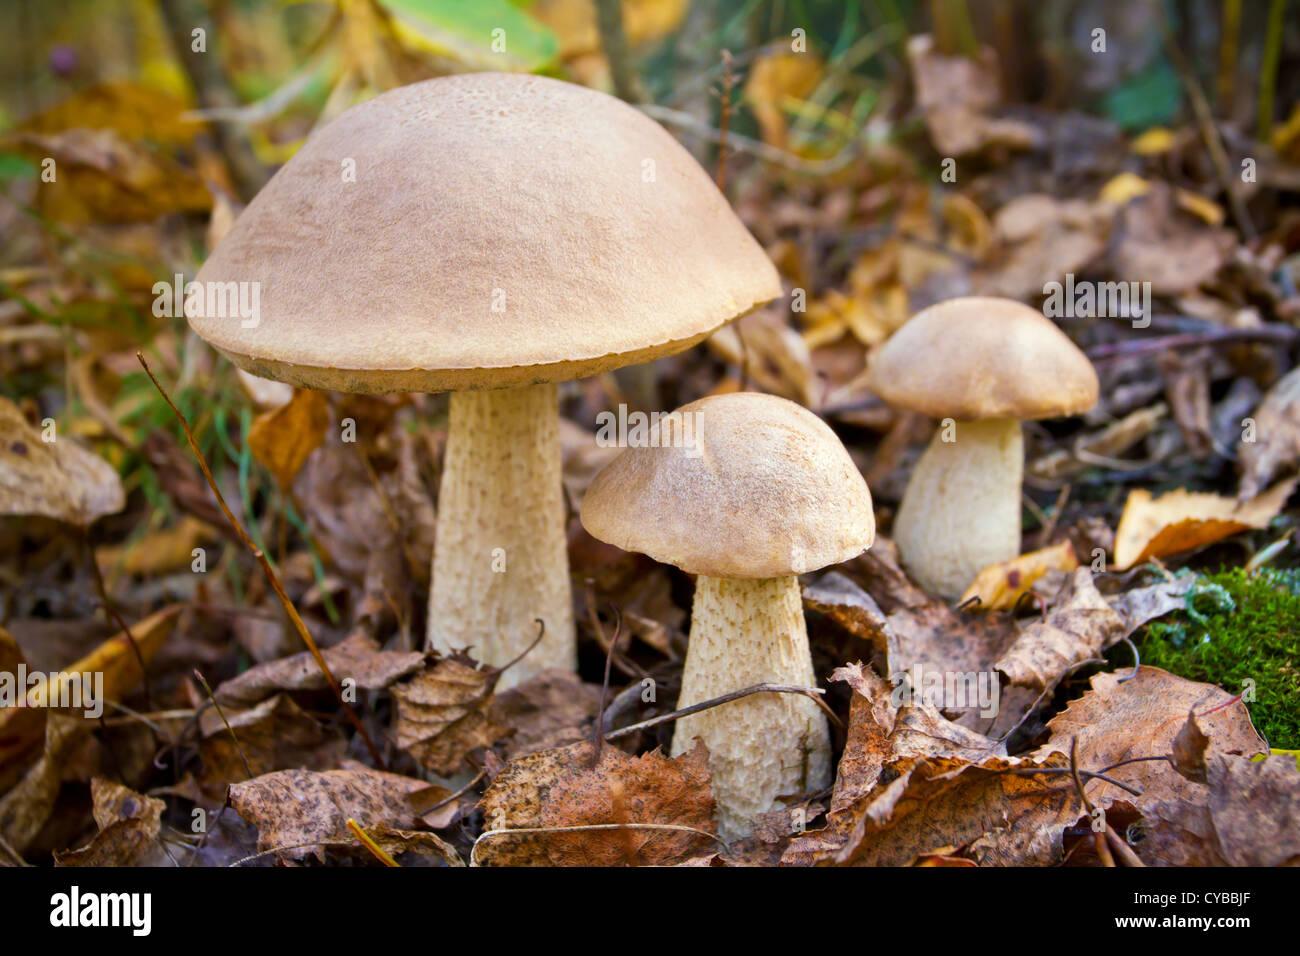 Autumn forest eatable mushrooms close-up - Stock Image